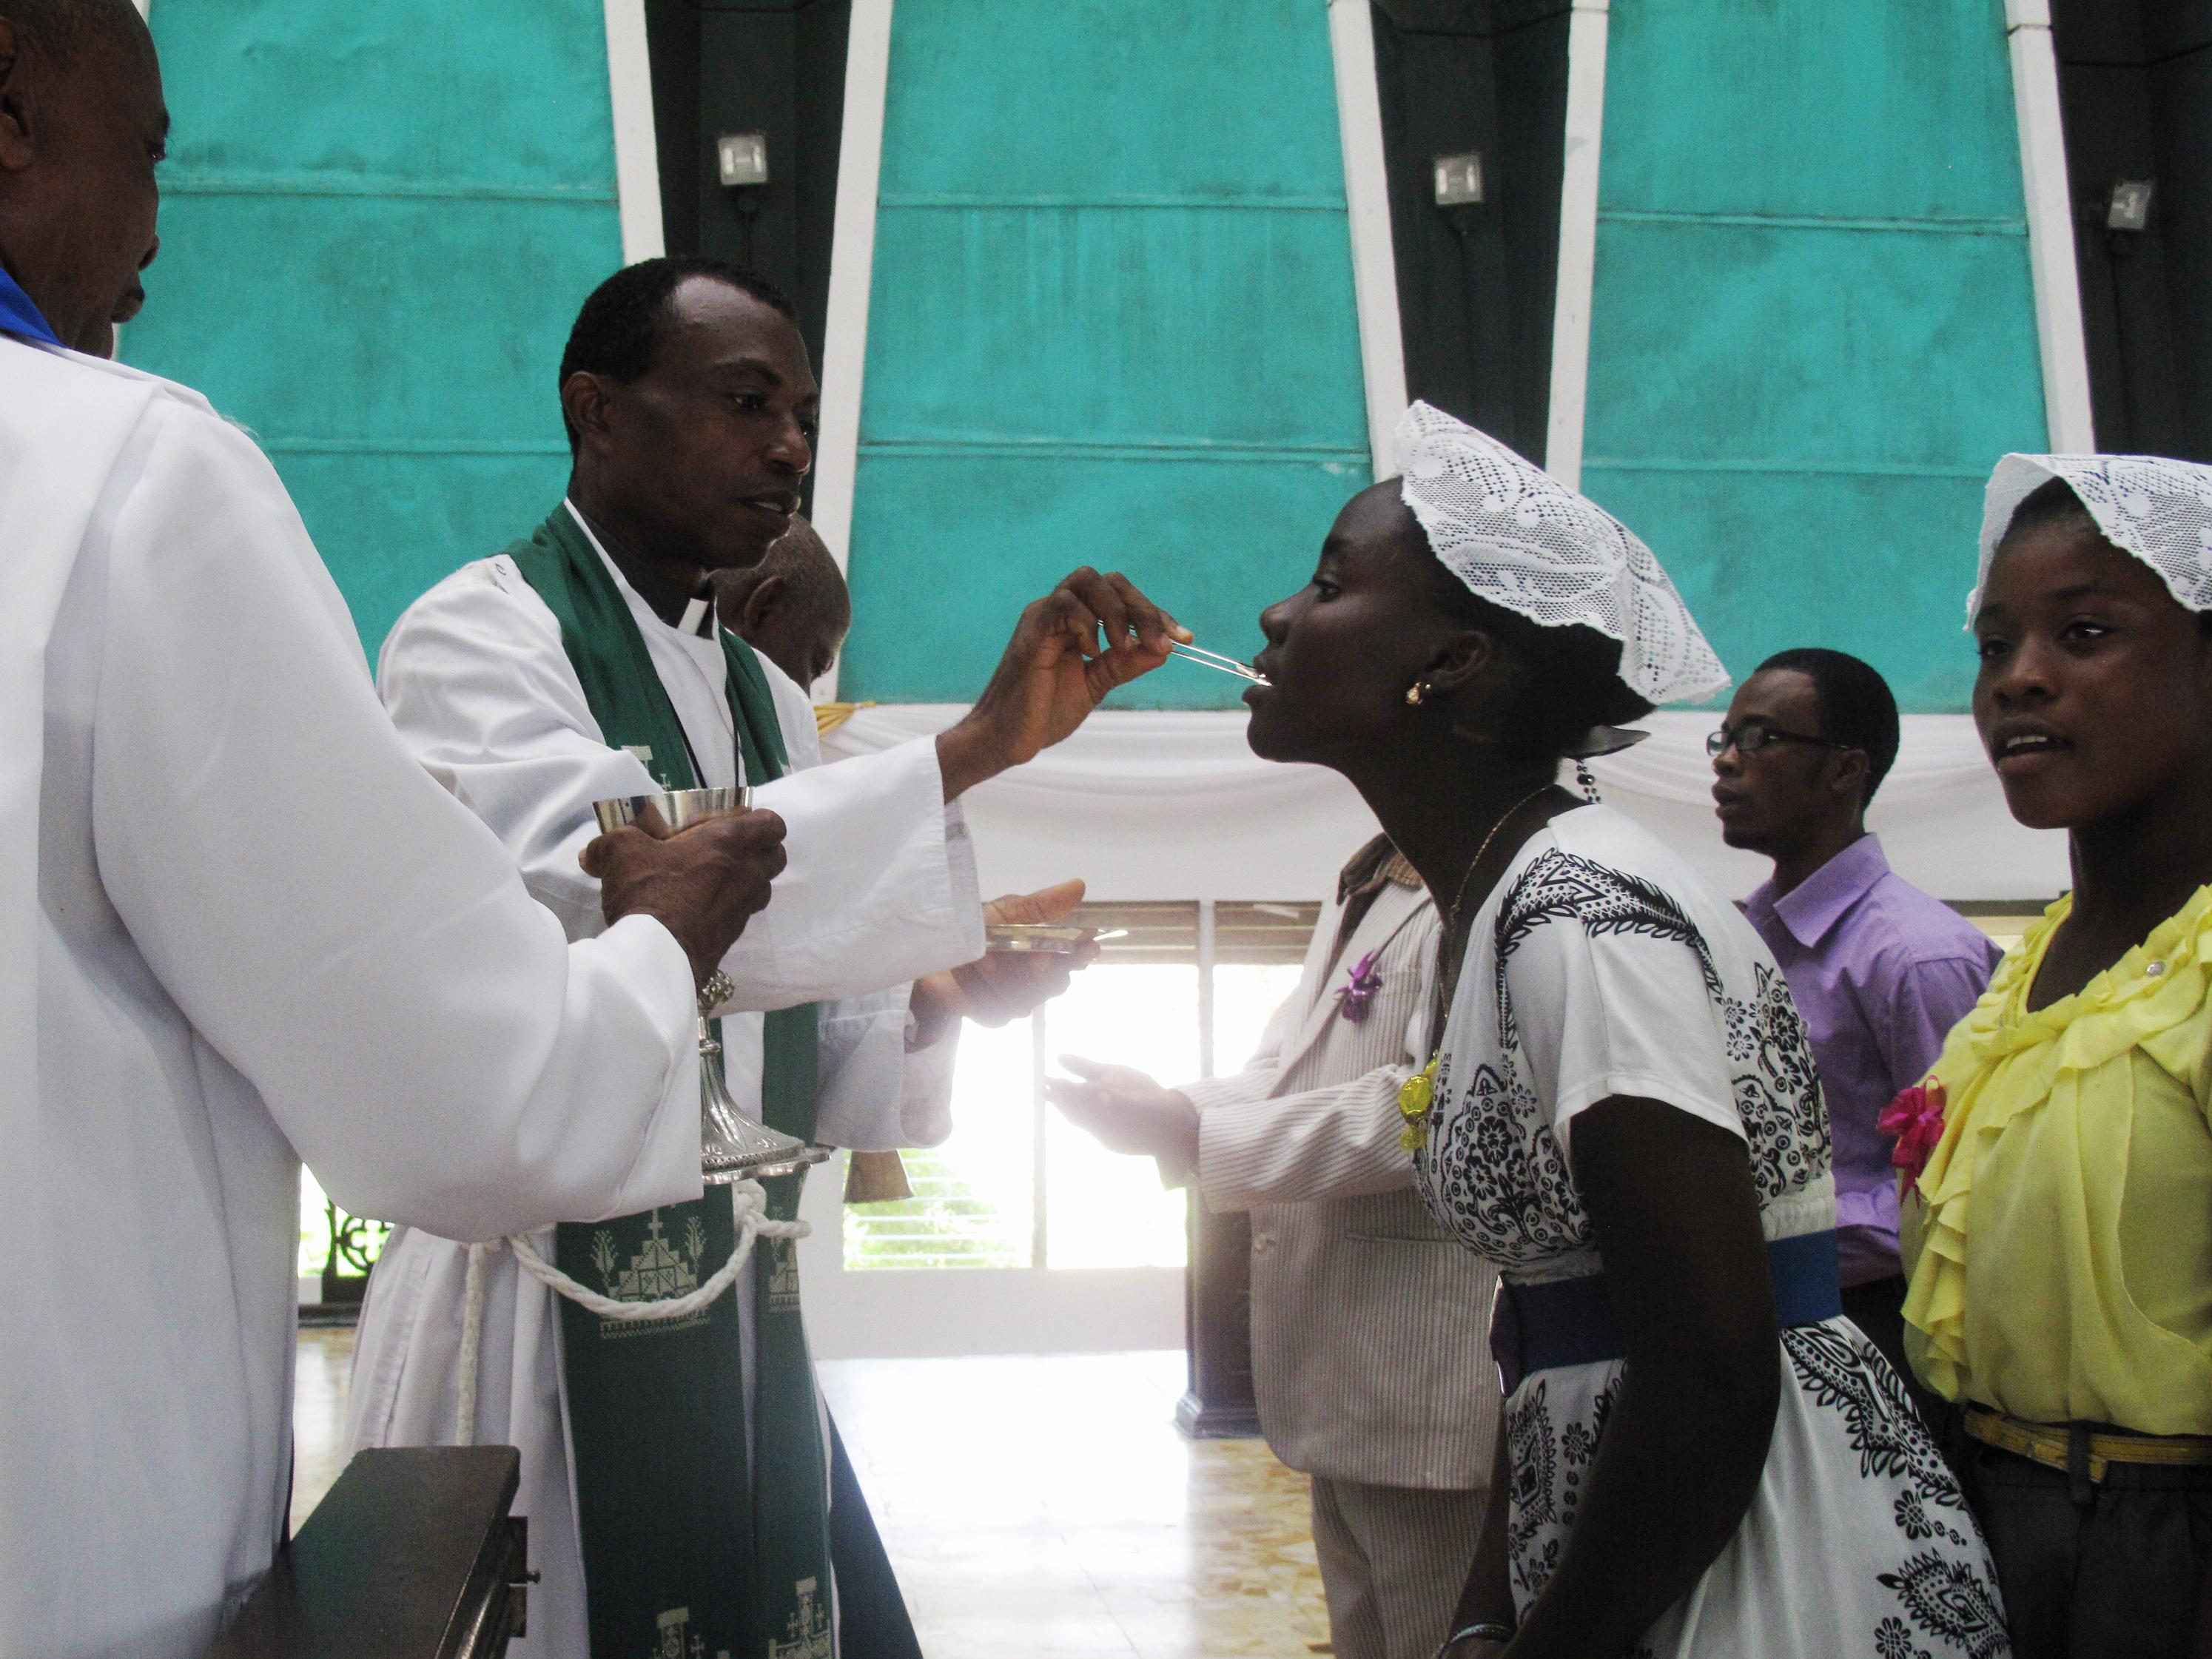 Ebola In Church: A Reverend's Quarantine Spreads The Word